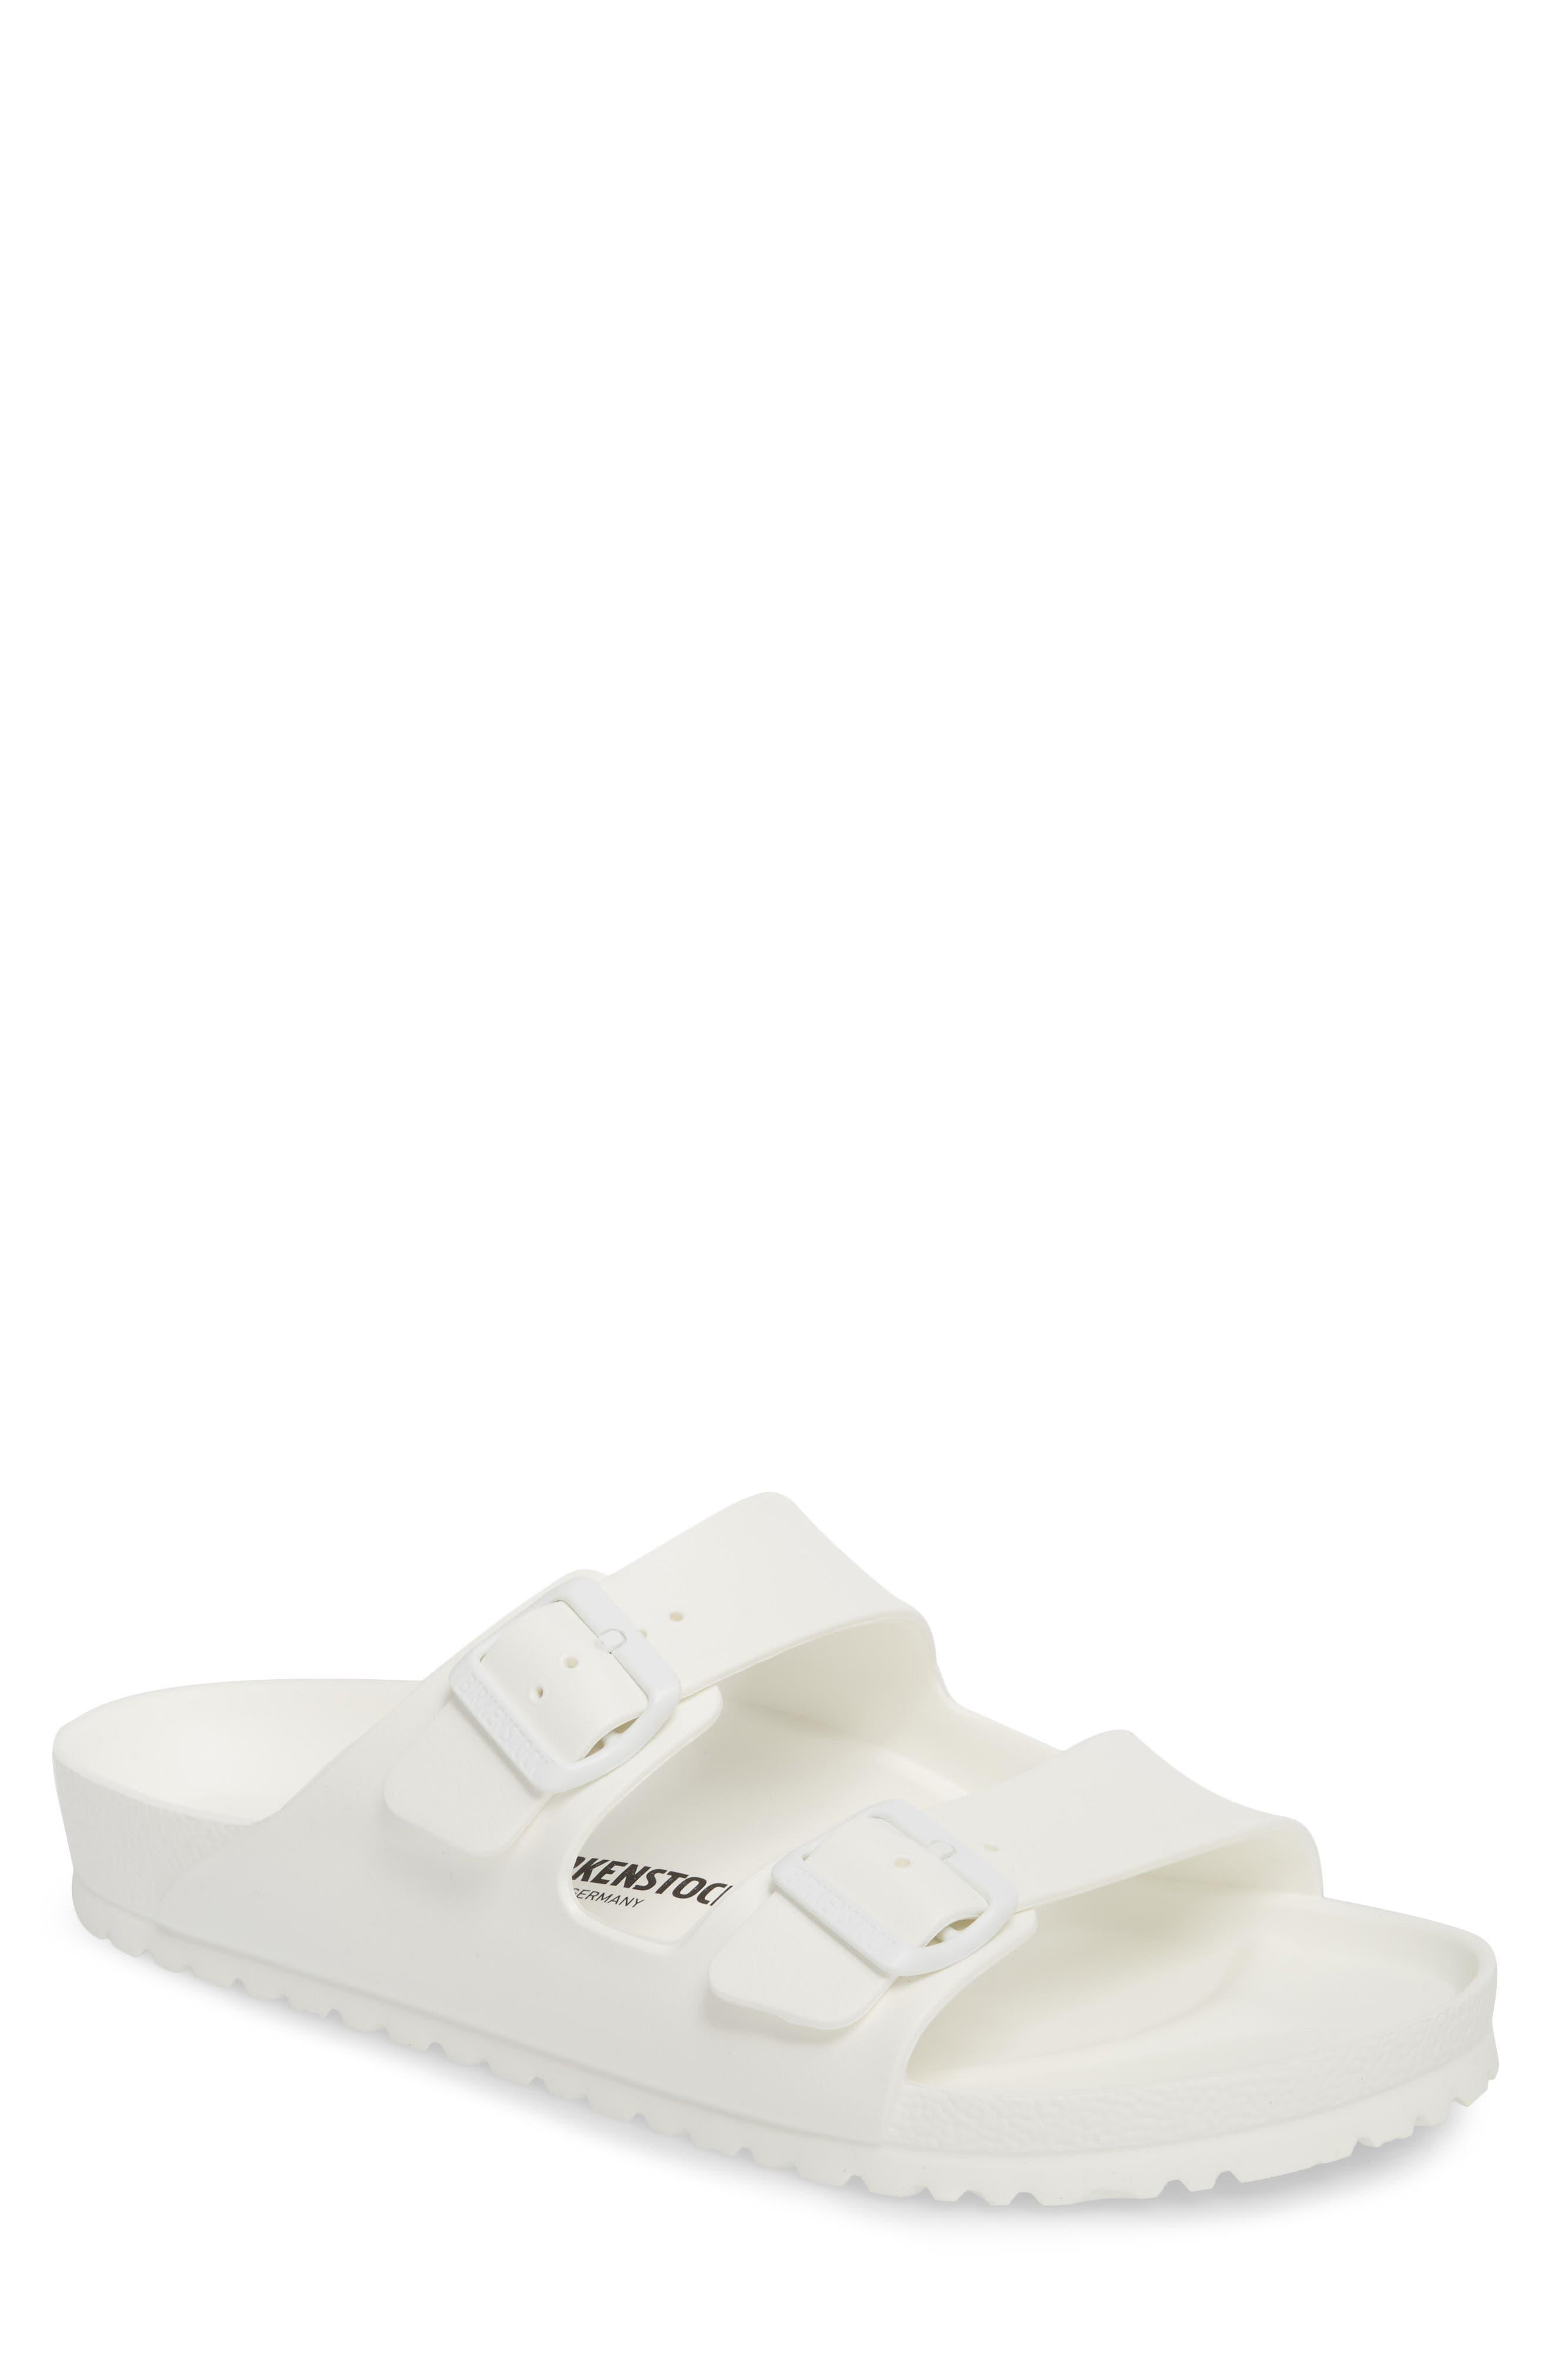 Birkenstock Essentials Arizona Eva Waterproof Slide Sandal,8.5 - White